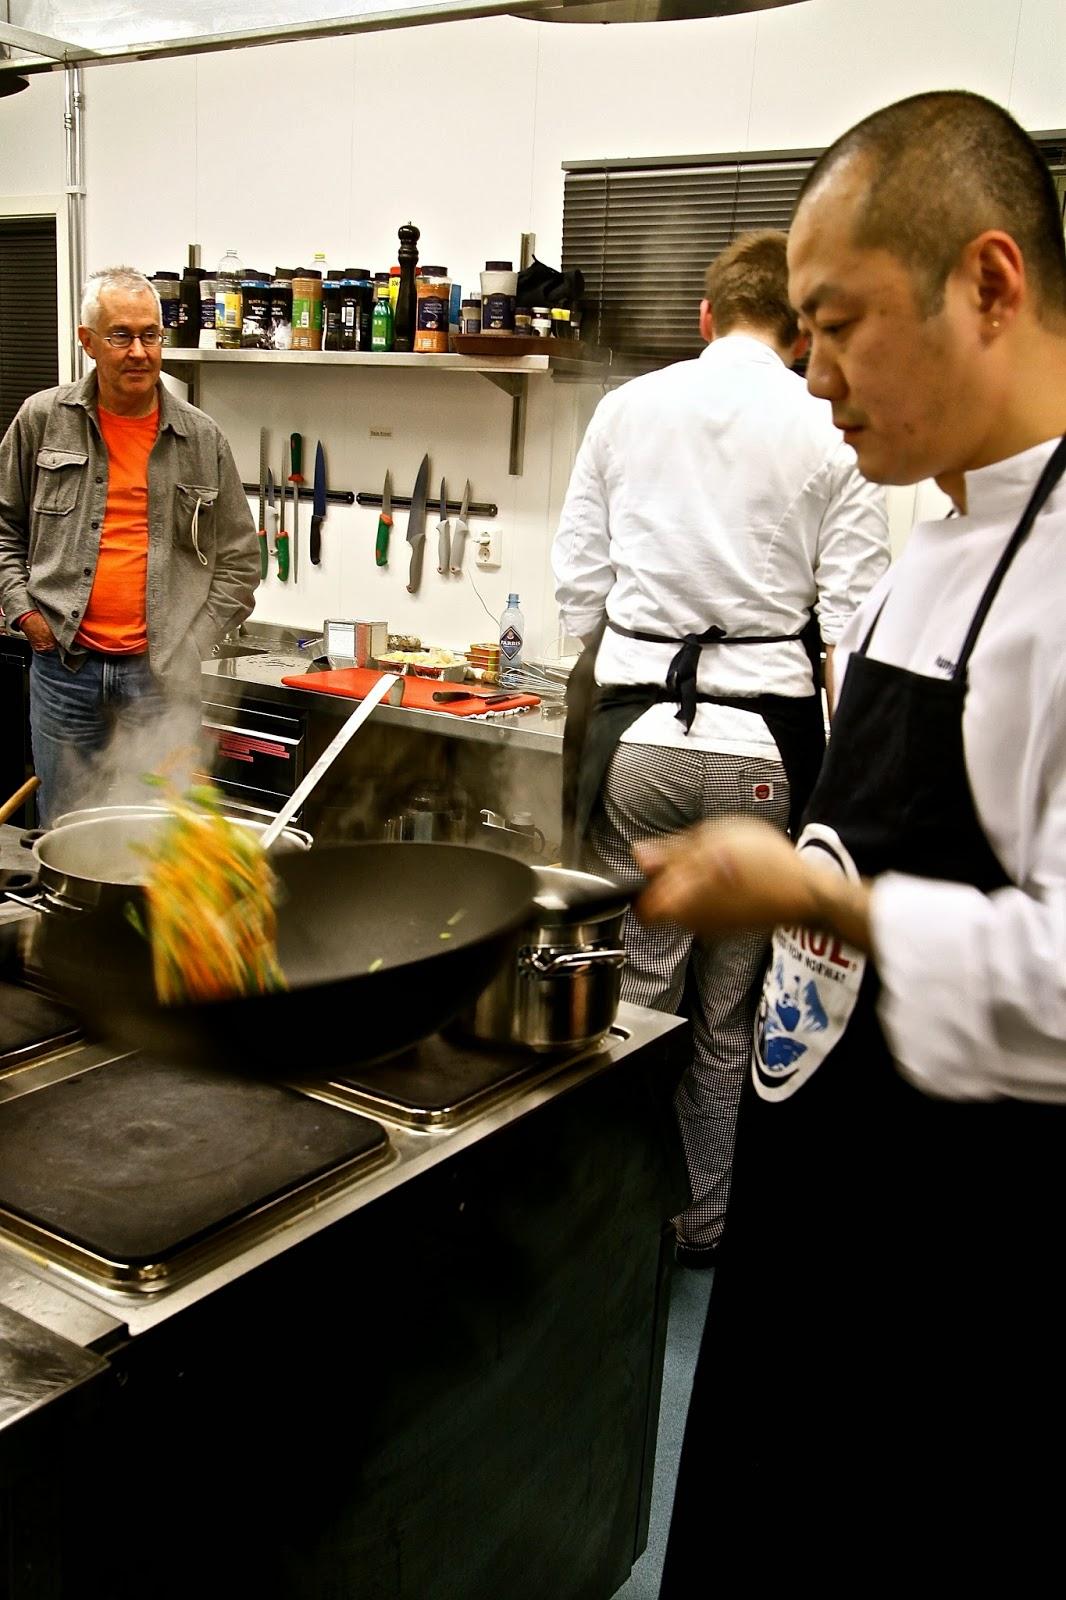 Oceana Restaurant Kitchen Nightmares Closed